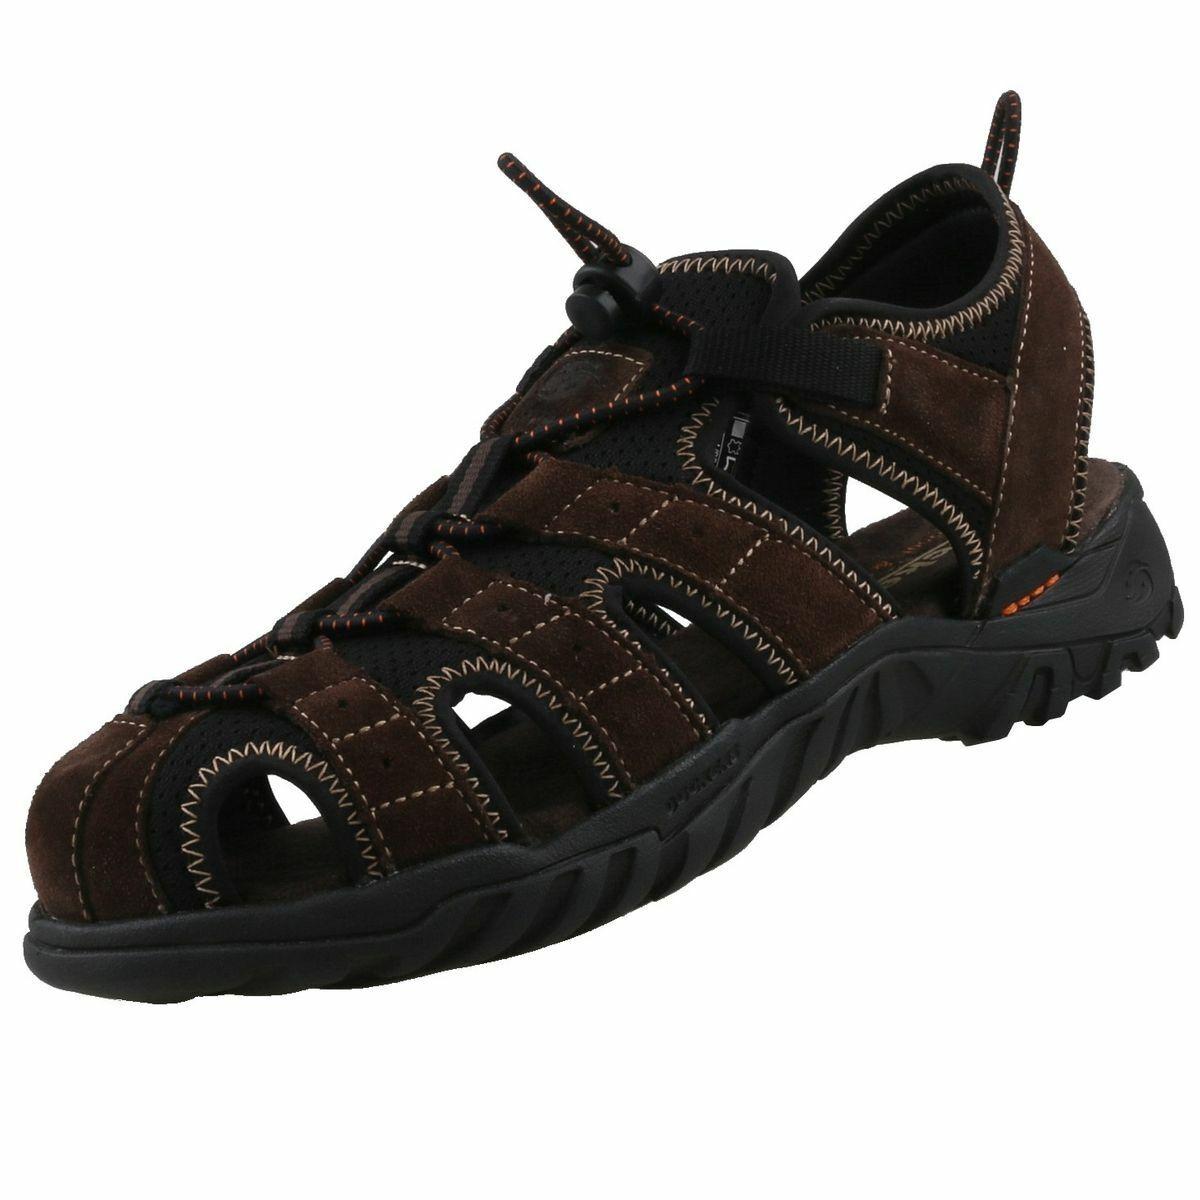 NUOVO DOCKERS Uomo Scarpe Sandali Sandali Sandali outdoorsandalen Trekking Sandalo Scarpe in pelle 94b72f